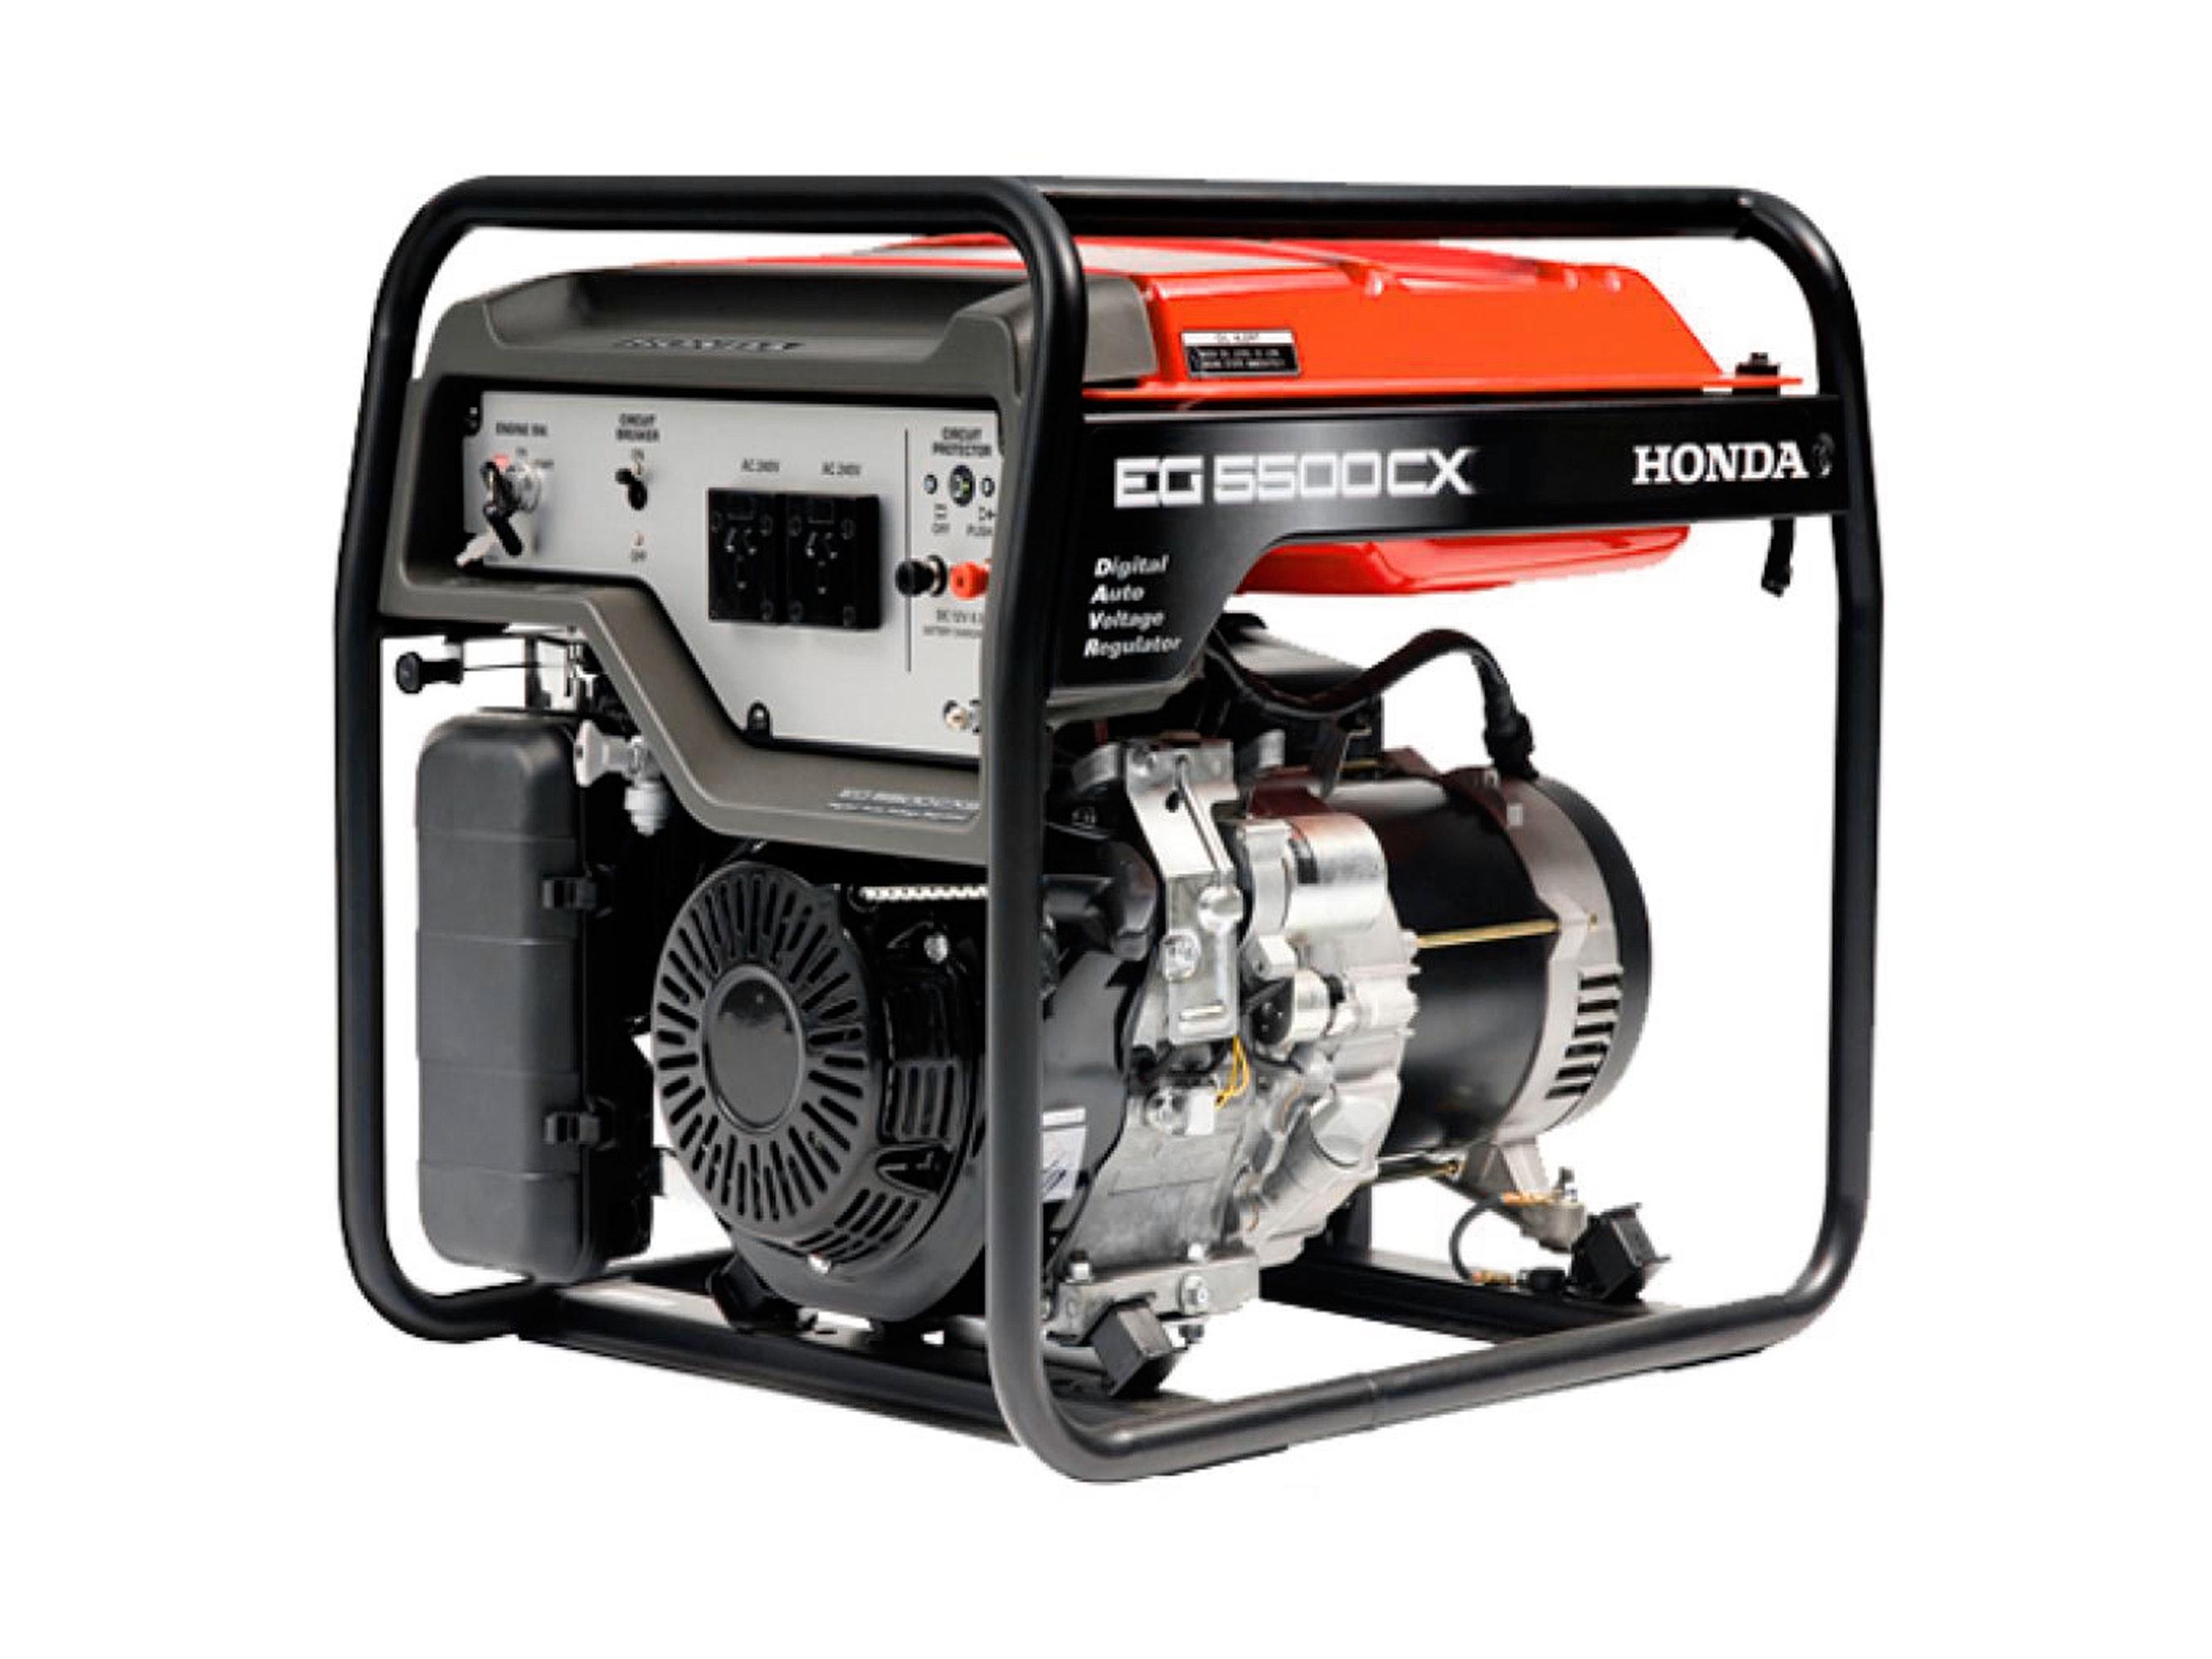 Honda EG5500CX Generator 5500W